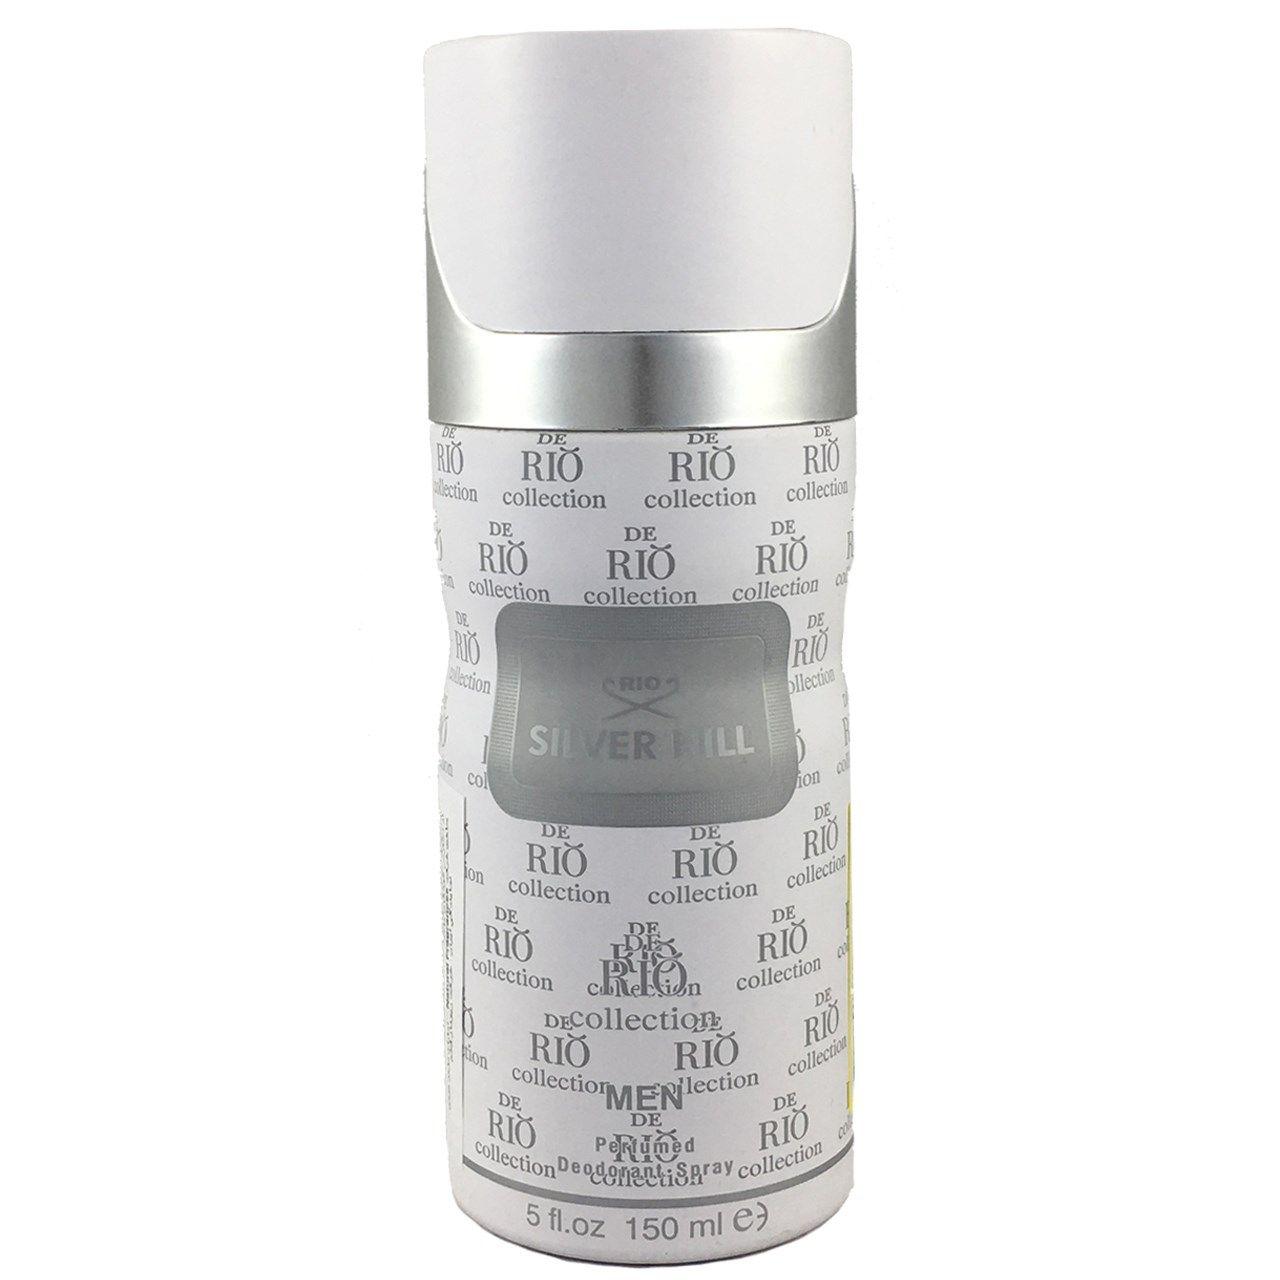 اسپری ضد تعریق مردانه ریو کالکشن مدل Rio Silver Hill حجم 150ml -  - 1